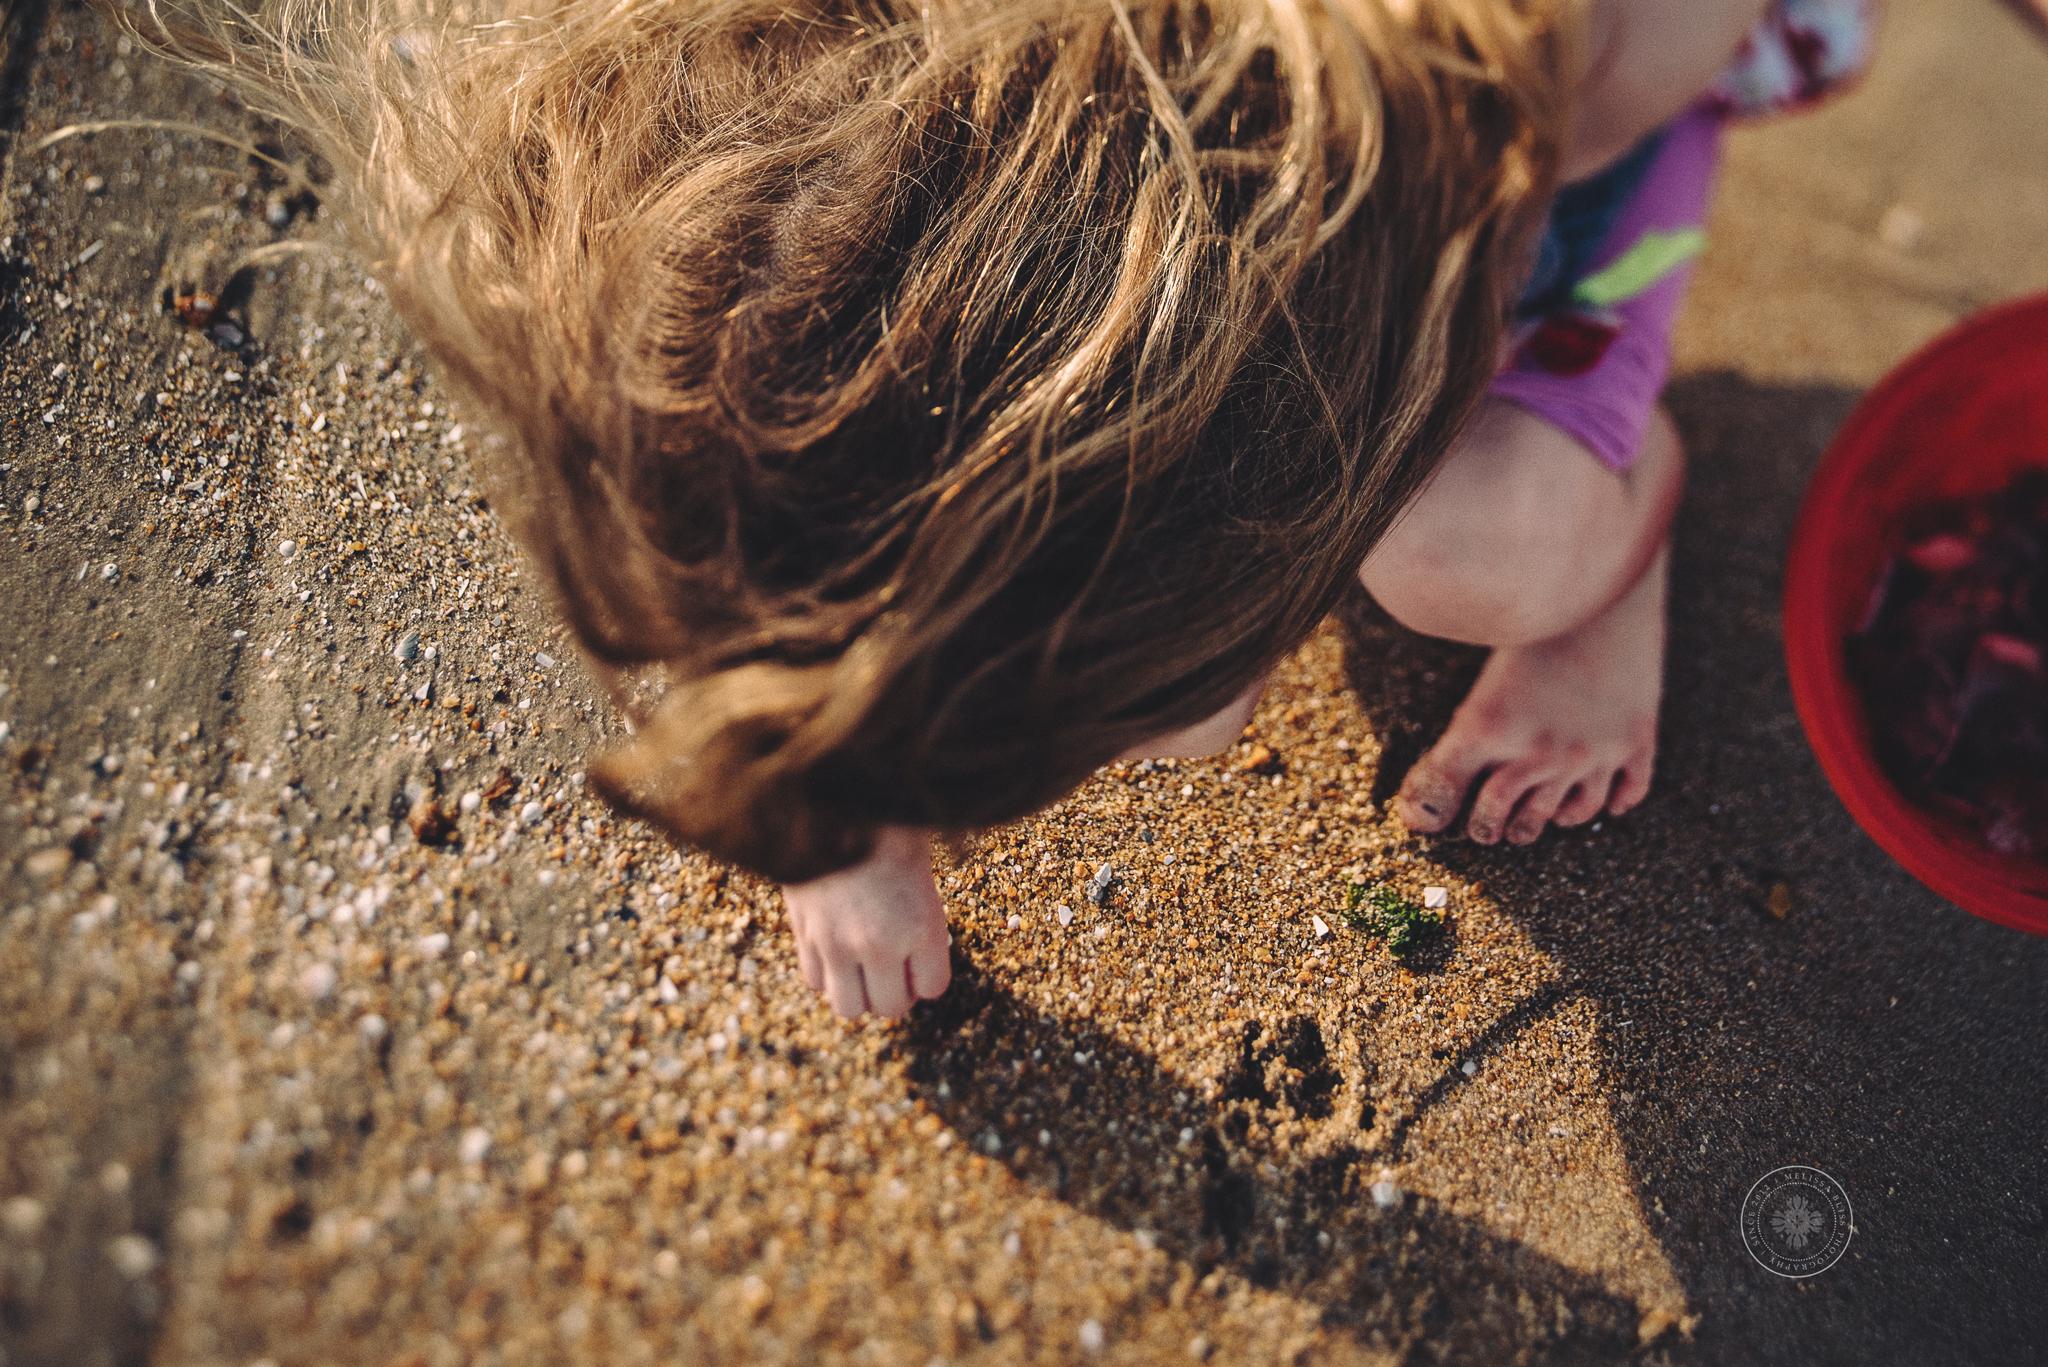 melissa-bliss-photography-top-beach-photographer-virginia-beach-sandbridge-young-girl-picks-up-shells